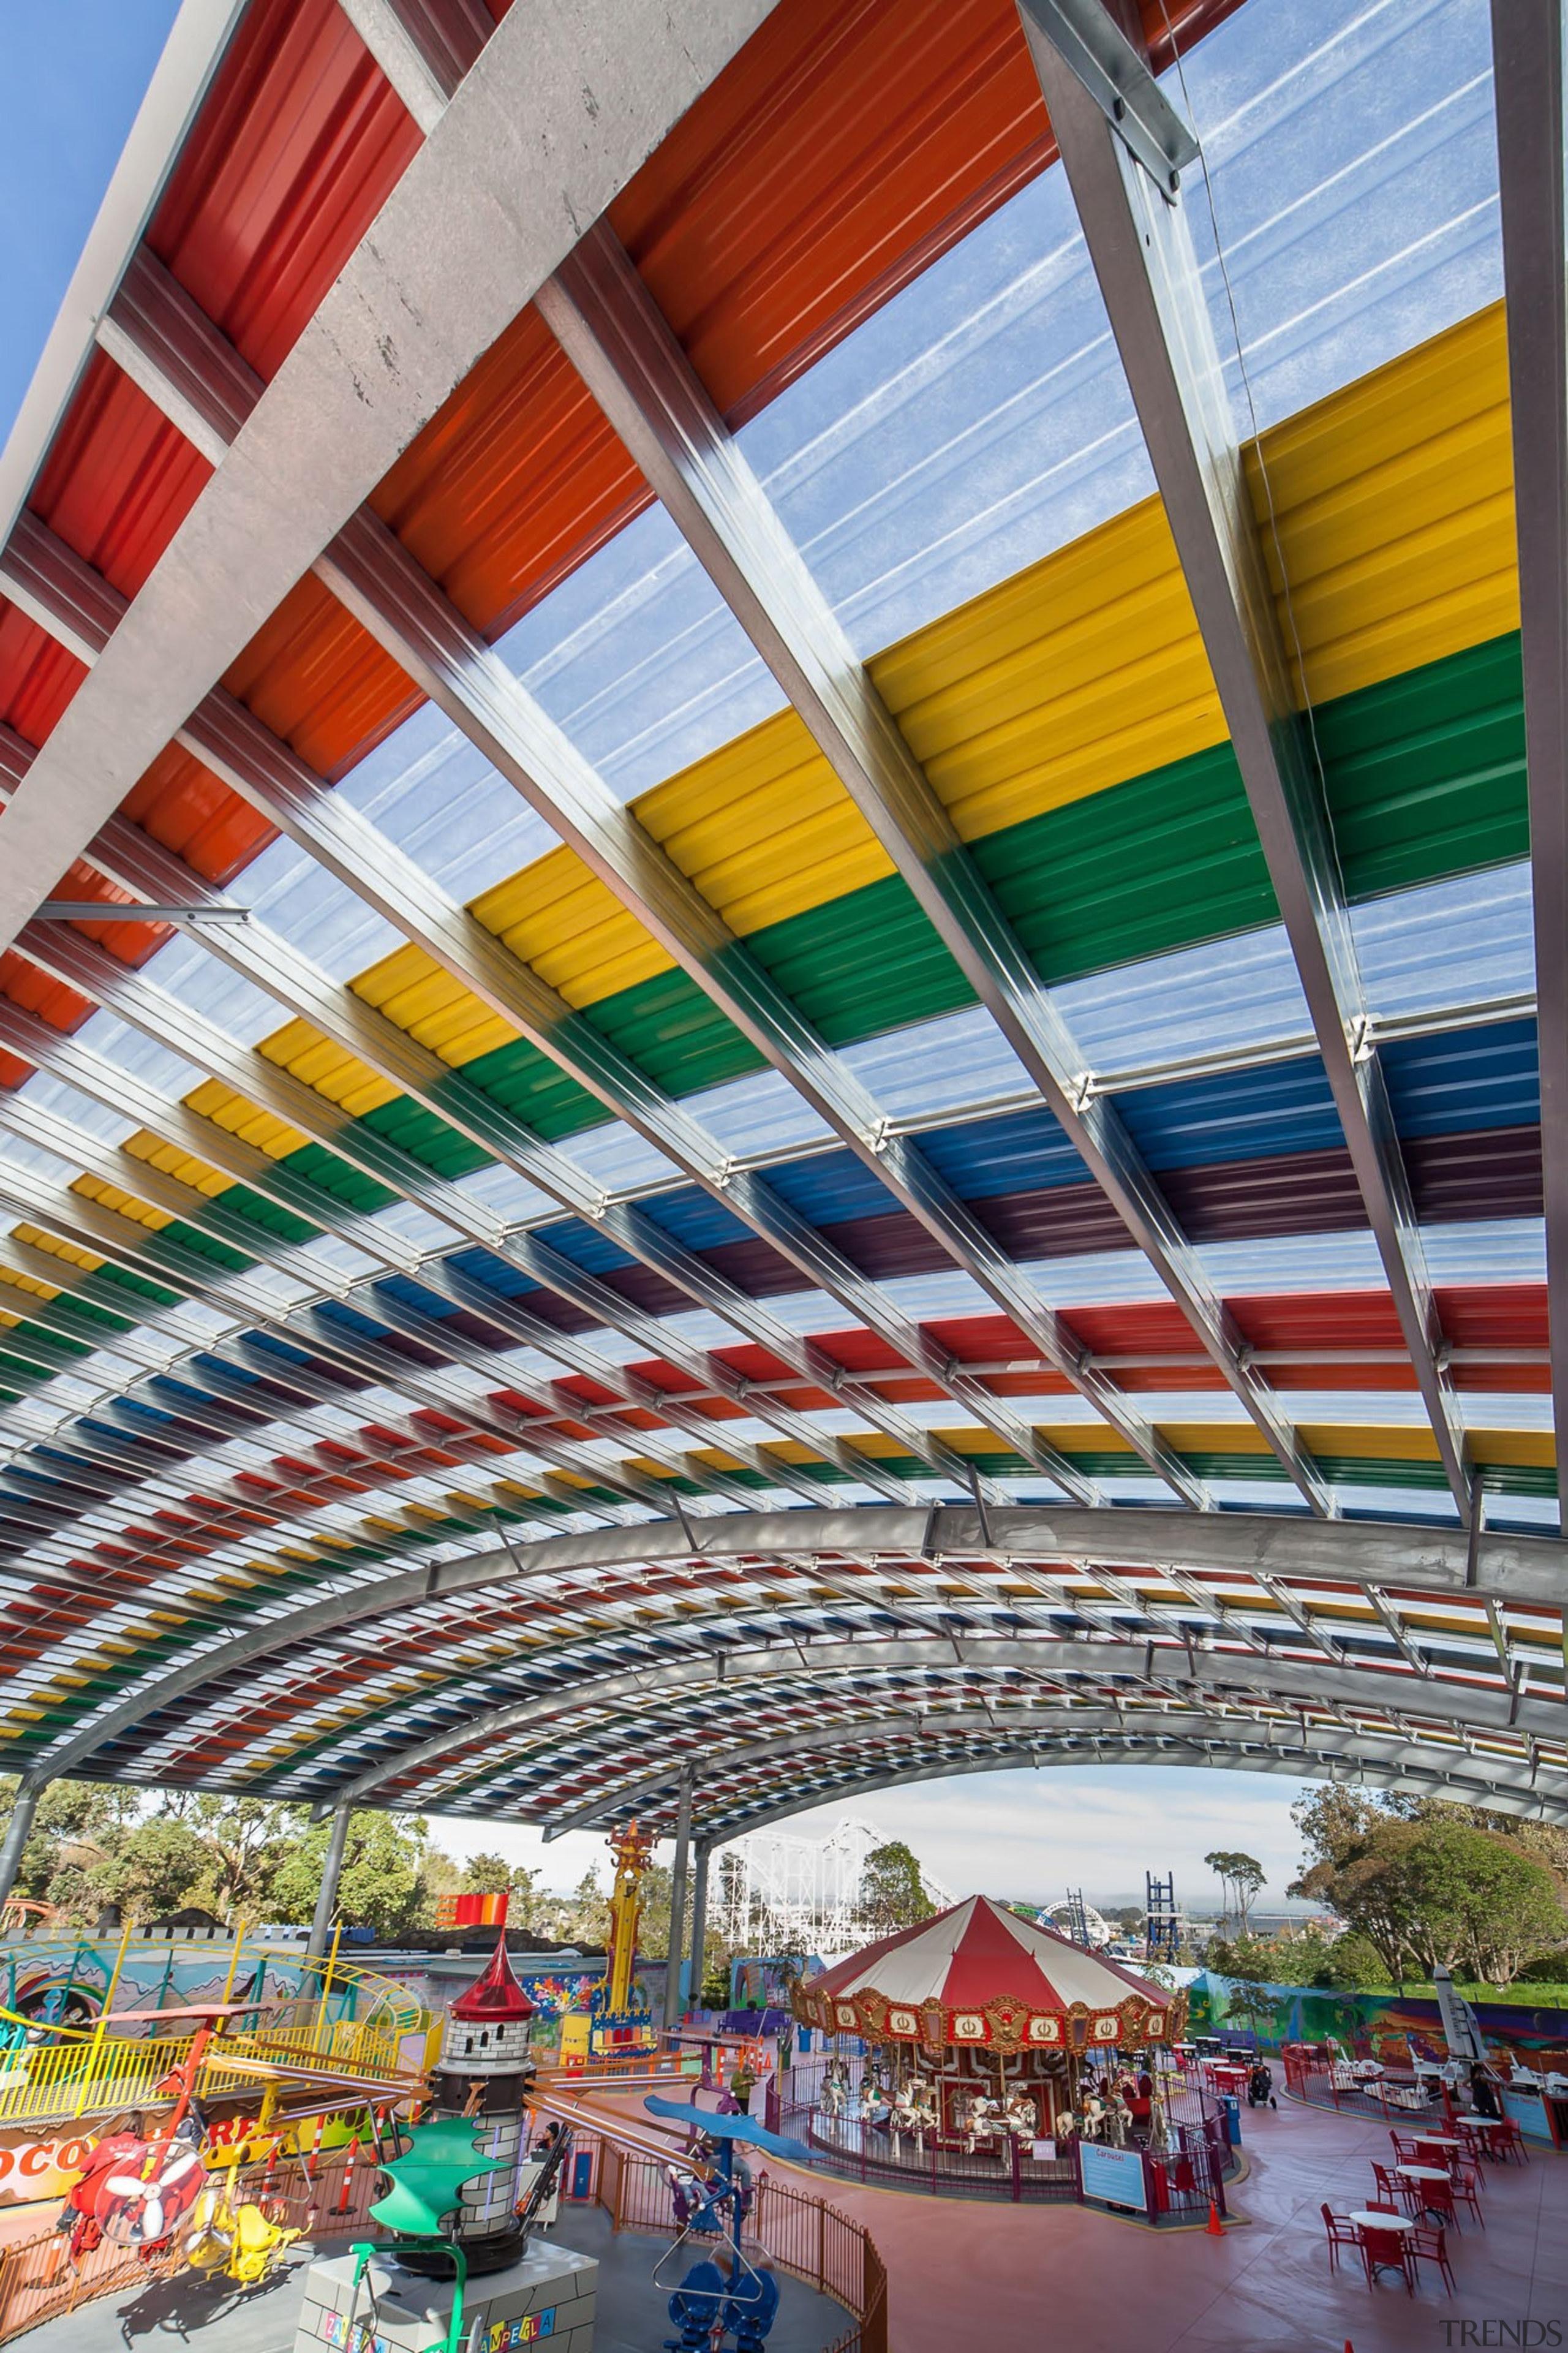 Dimond-Rainbows End - 46 - Dimond - Rainbows architecture, building, landmark, leisure, metropolitan area, mixed use, sport venue, structure, urban area, gray